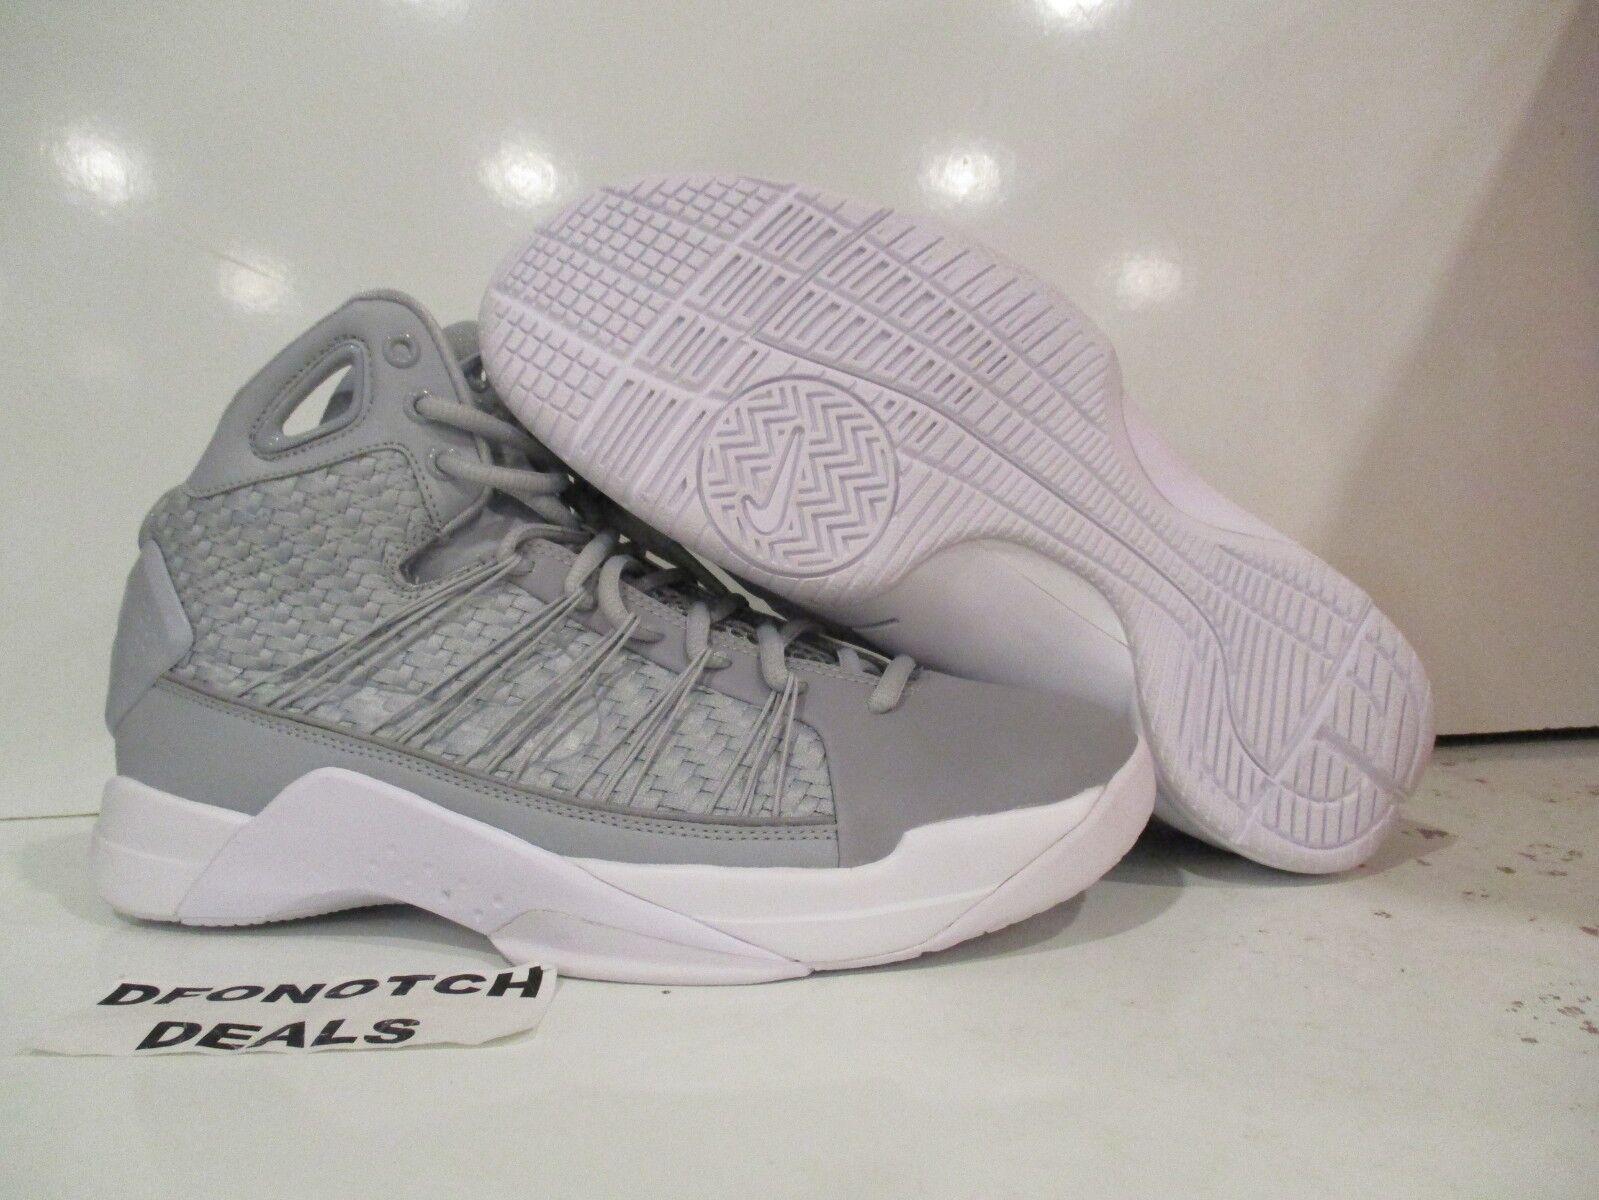 uk availability 40430 1c868 Men s Nike Hyperdunk Lux Basketball shoes Sz 10.5 10.5 10.5 Grey 818137-002  MSRP 170